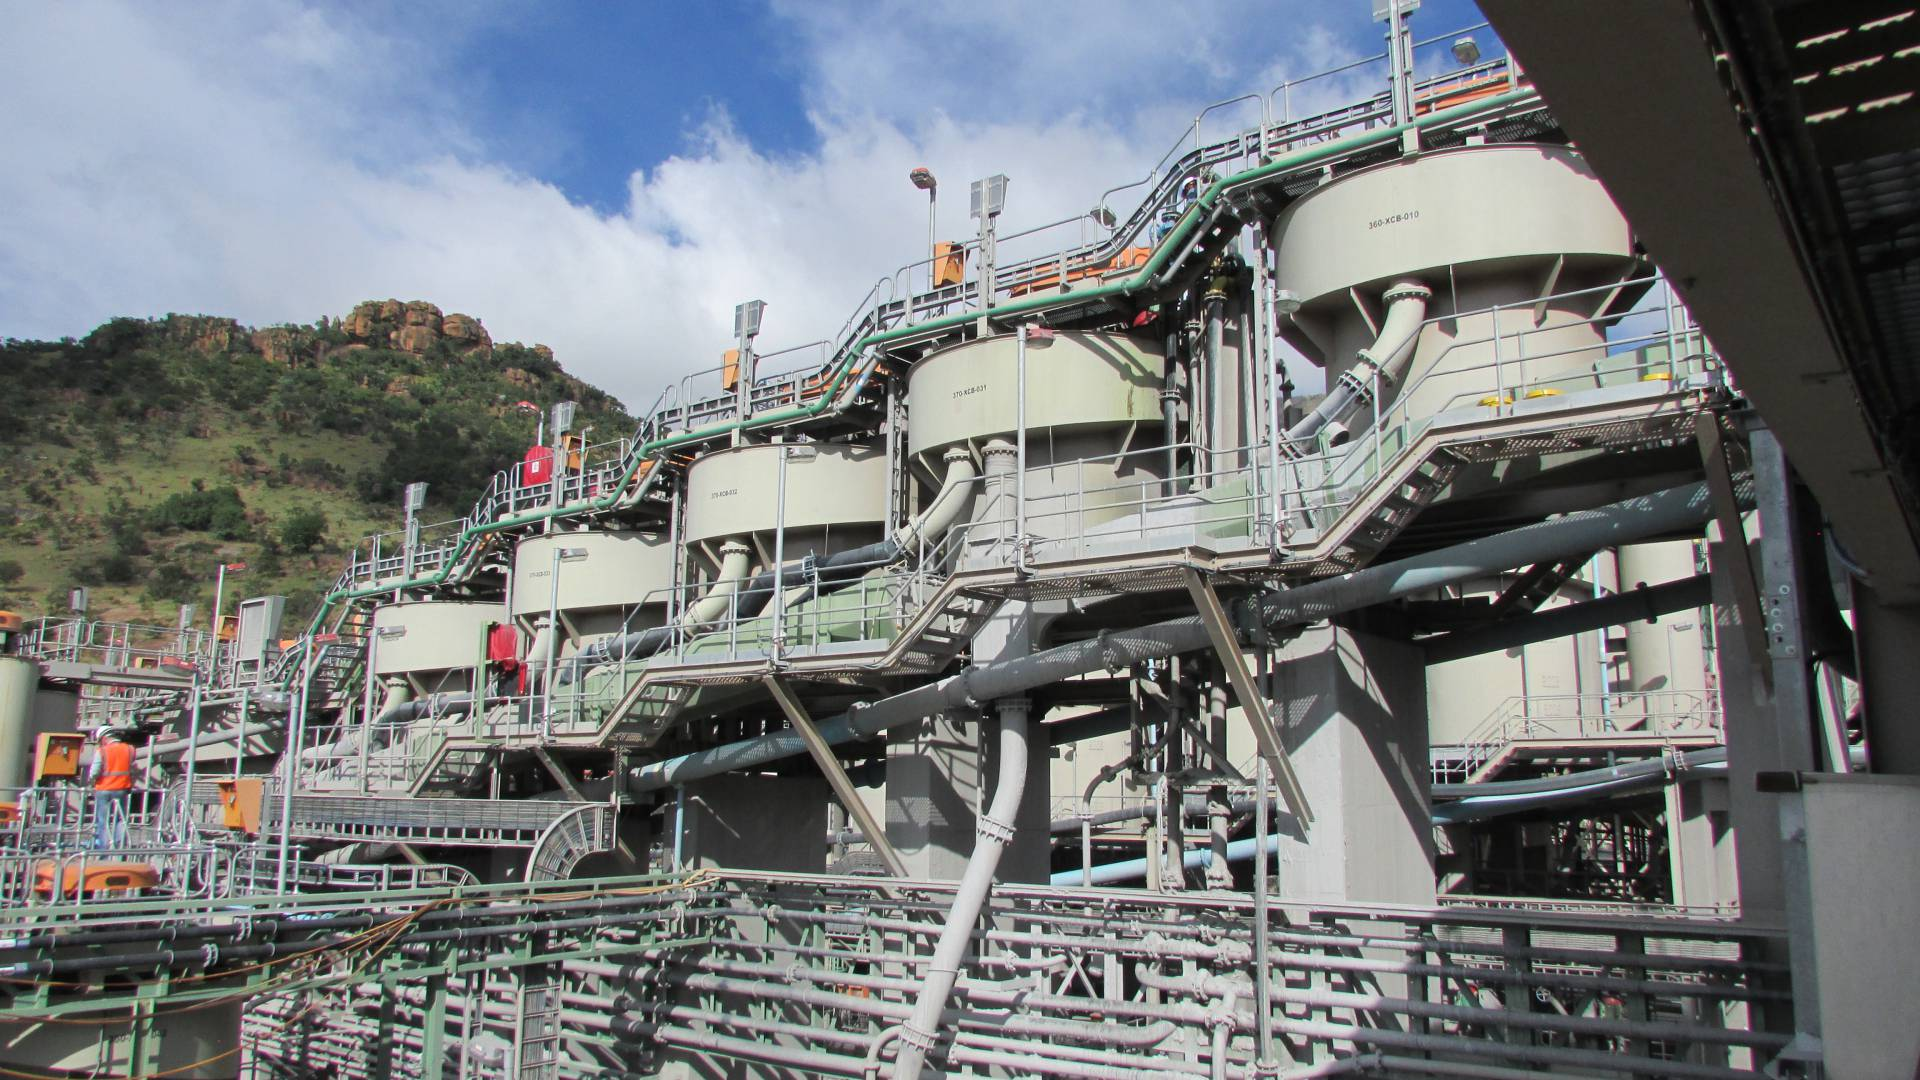 Level measurement in flotation banks in mines